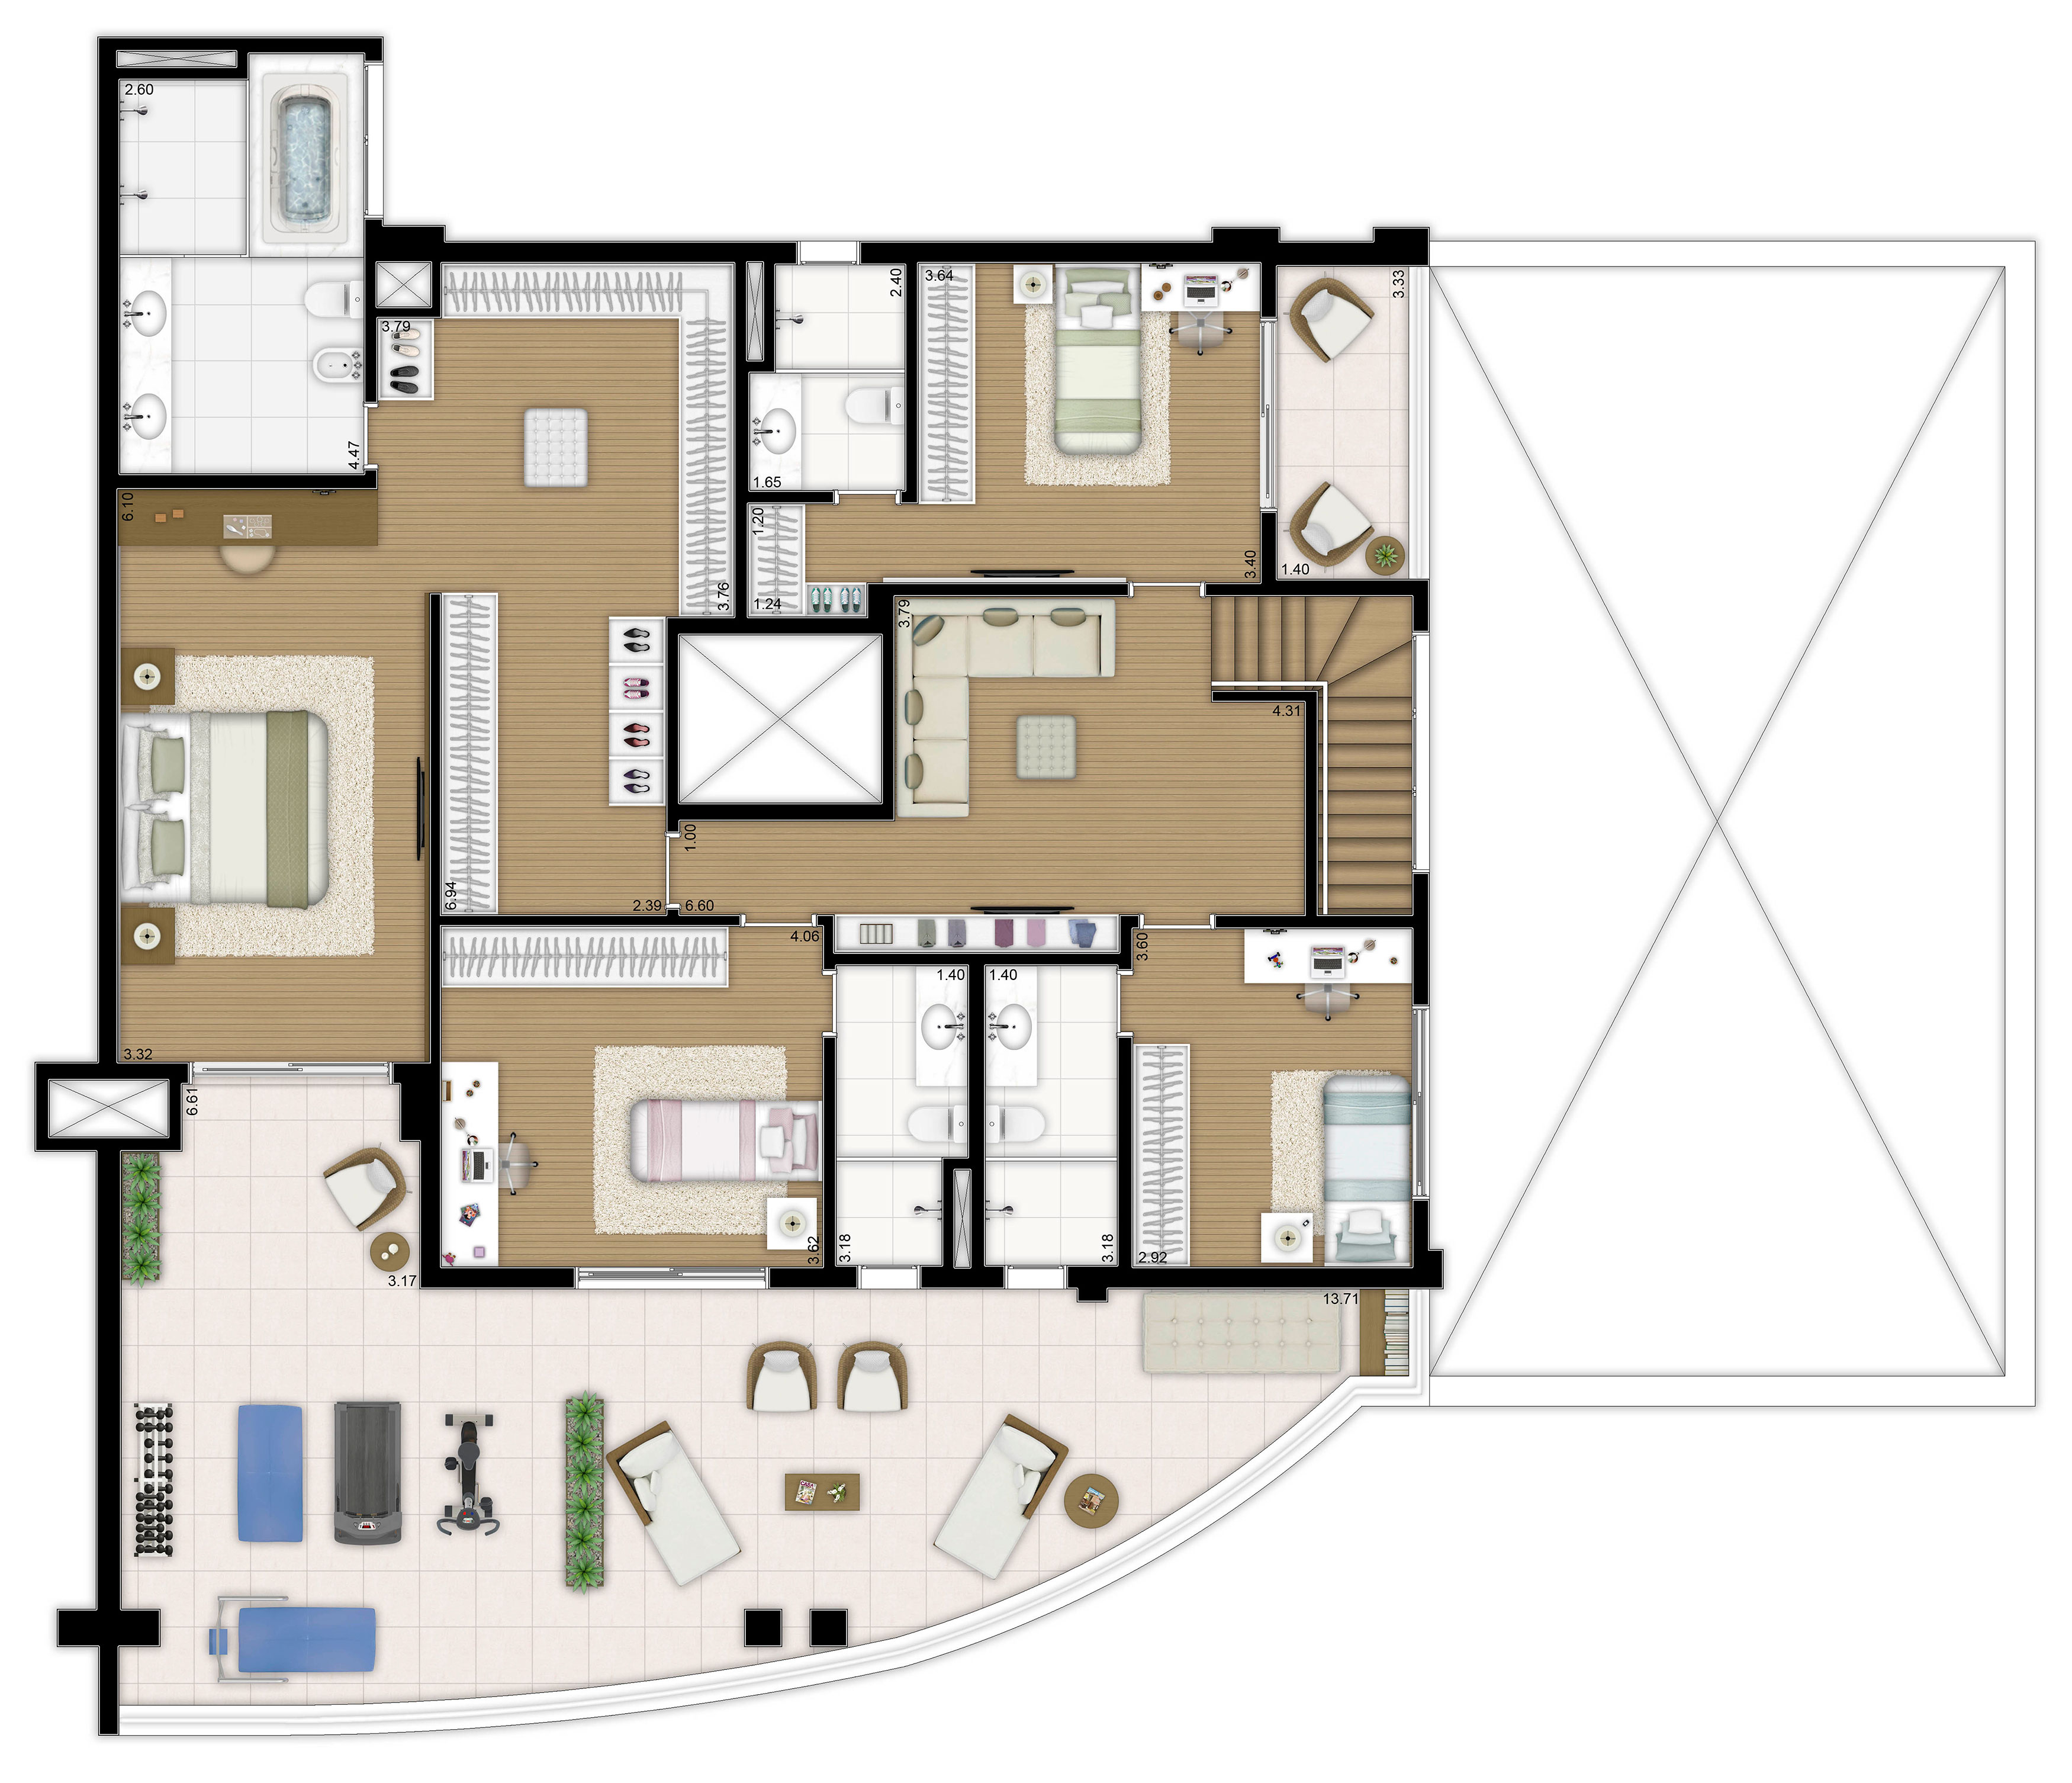 496m² - 4 suítes - Duplex superior